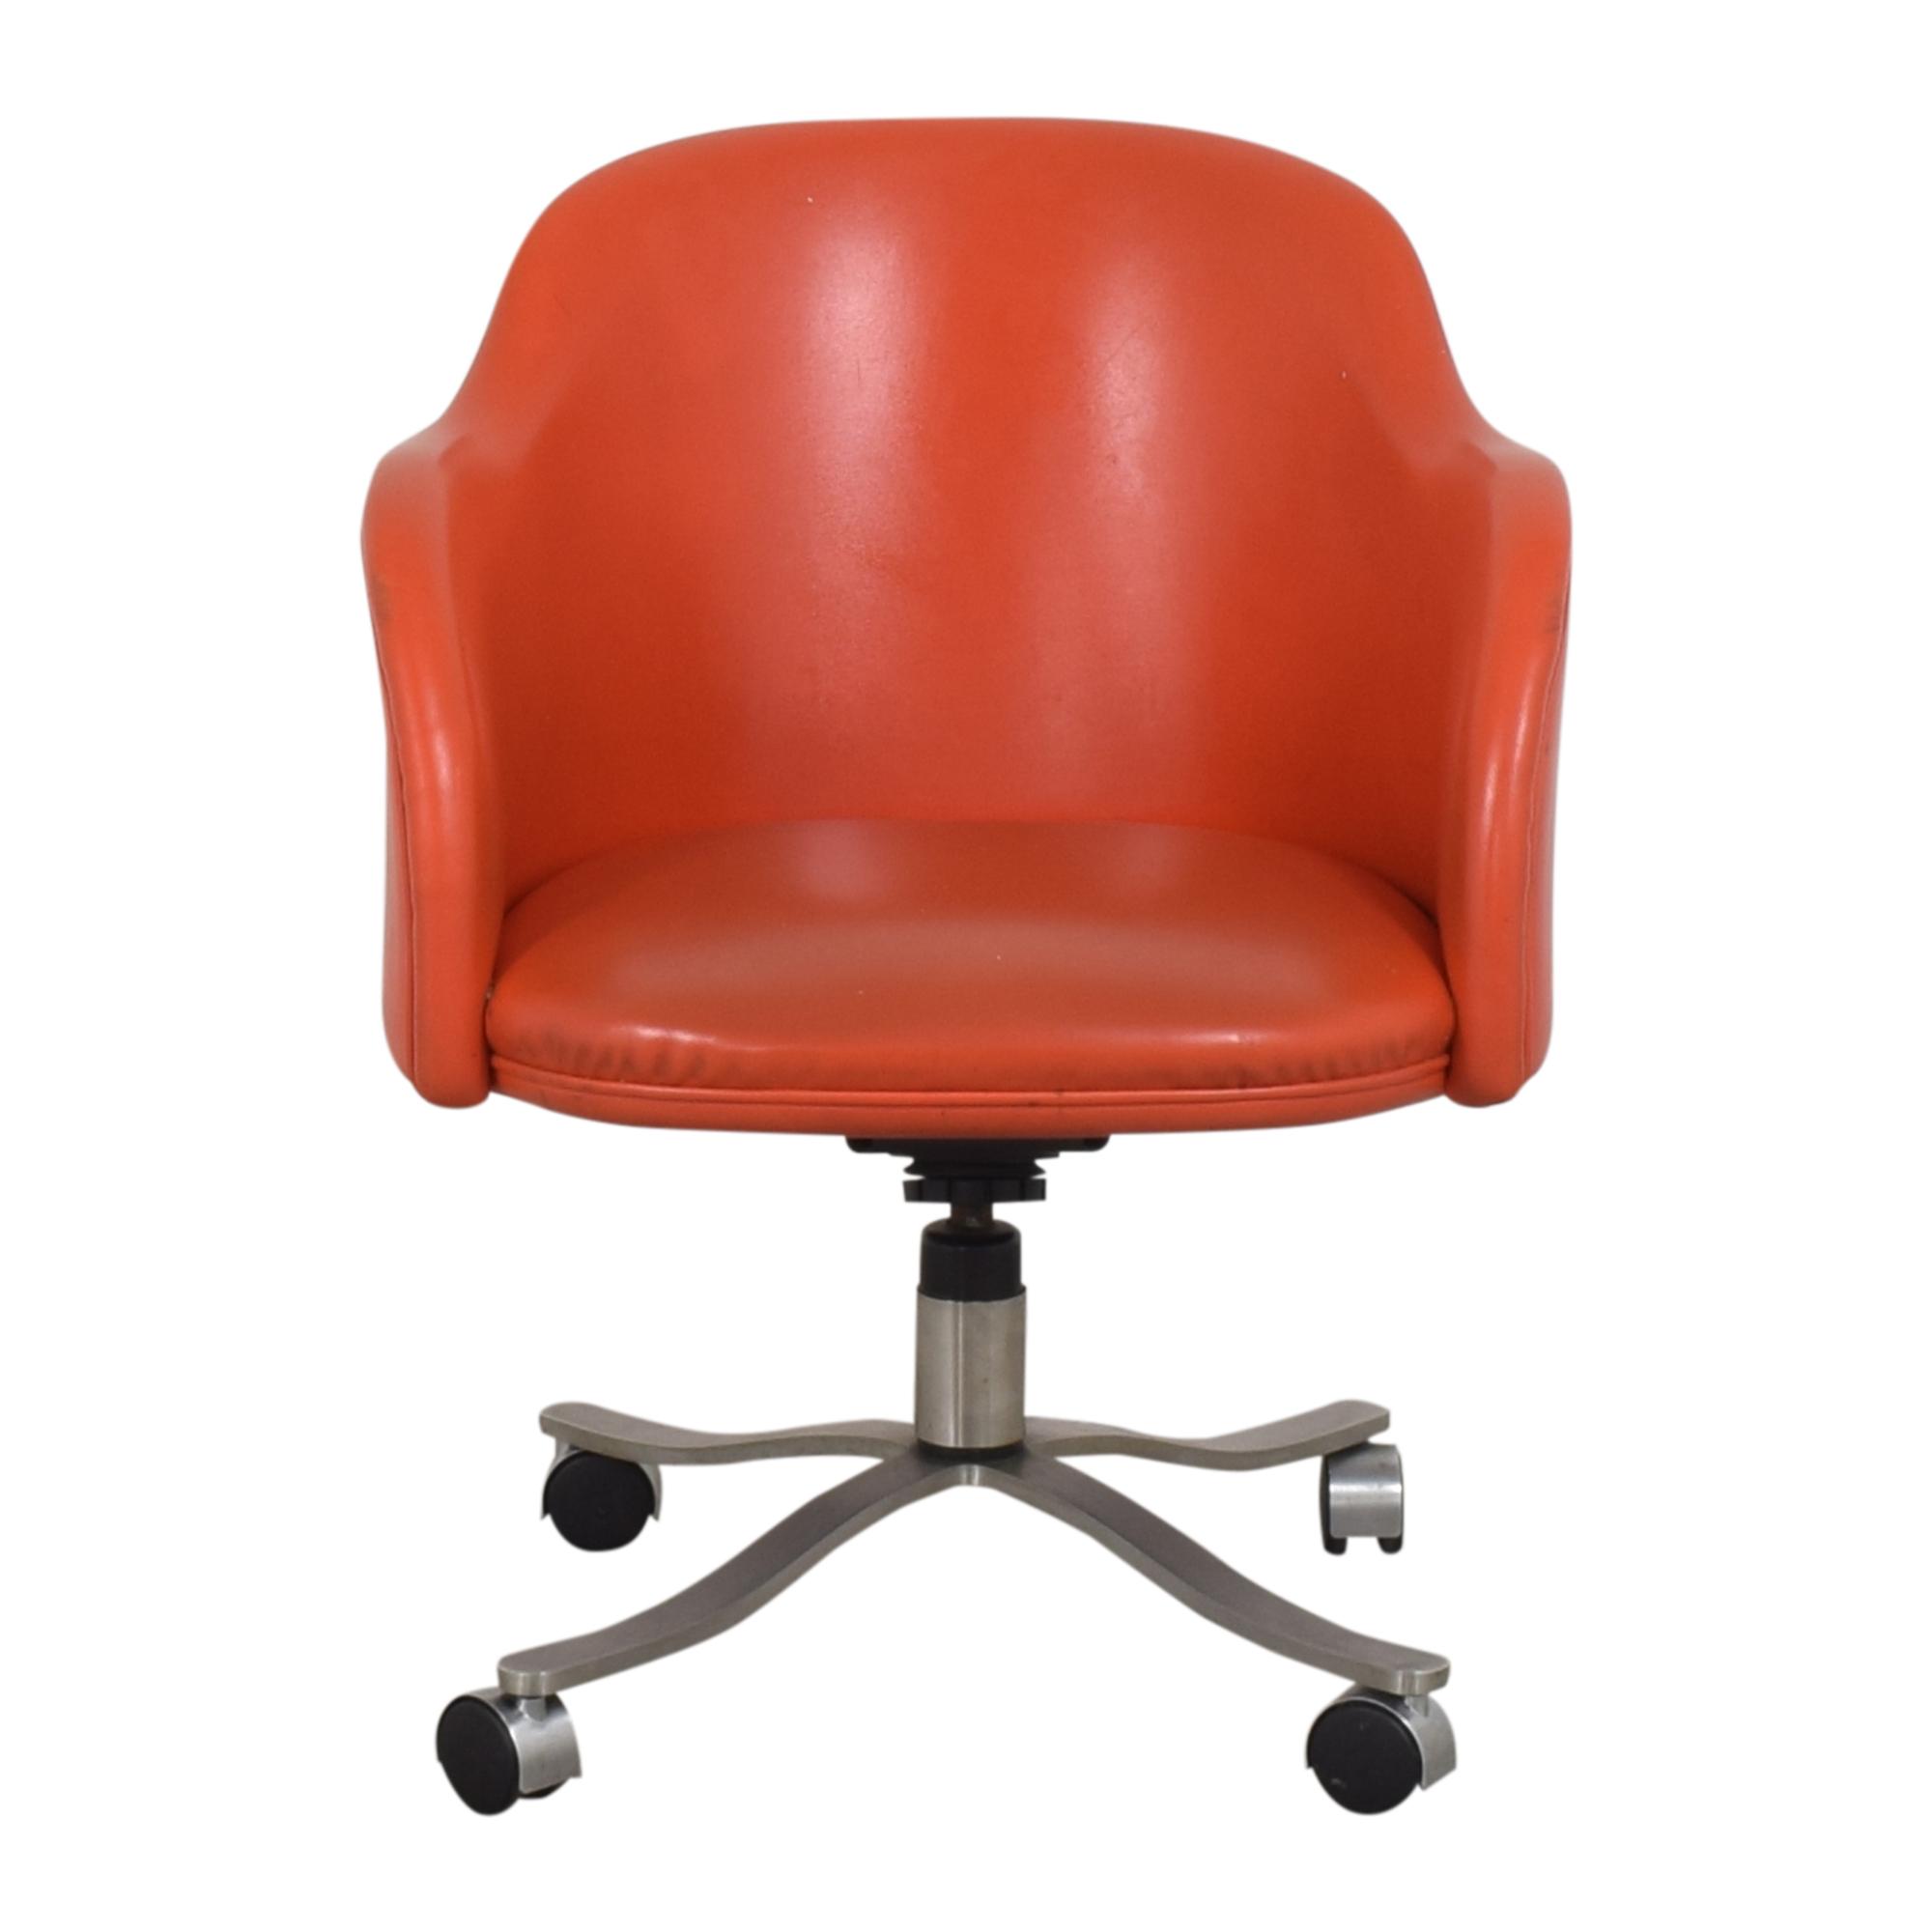 buy Zographos Designs Zographos Designs Bucket Chair online